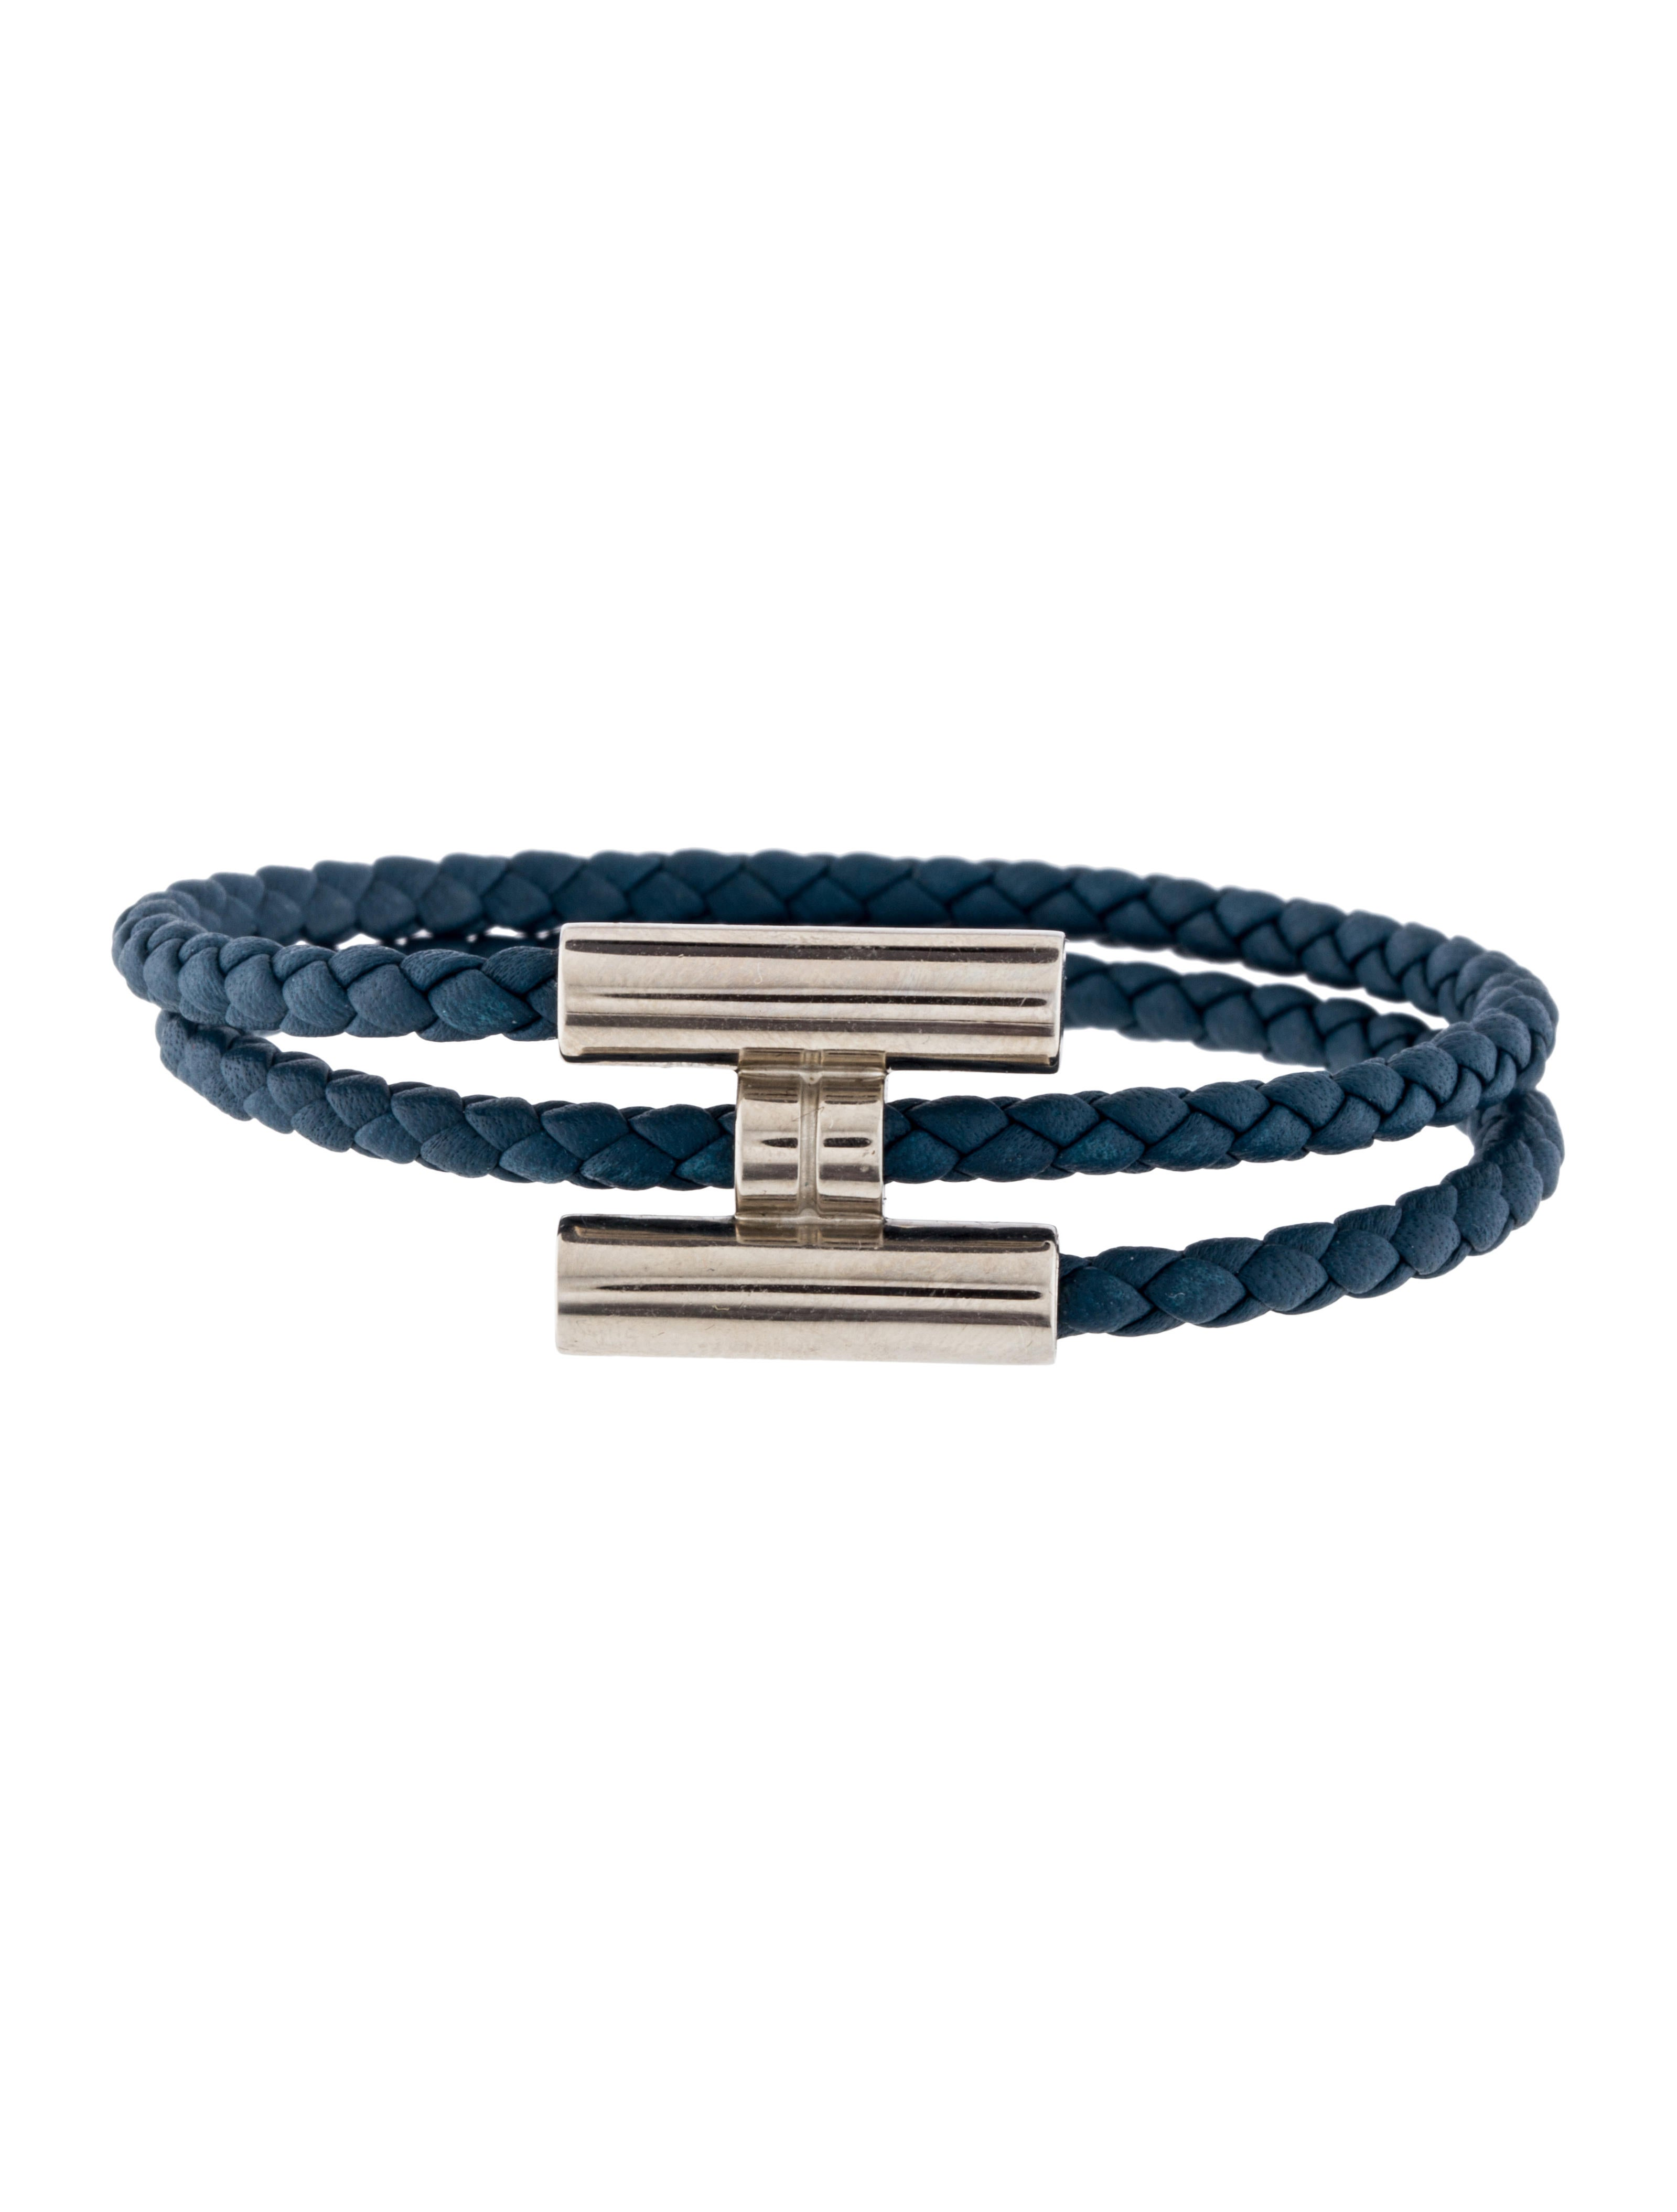 e3f6b7cb98b Hermès Tournis Tressé Bracelet - Bracelets - HER85179